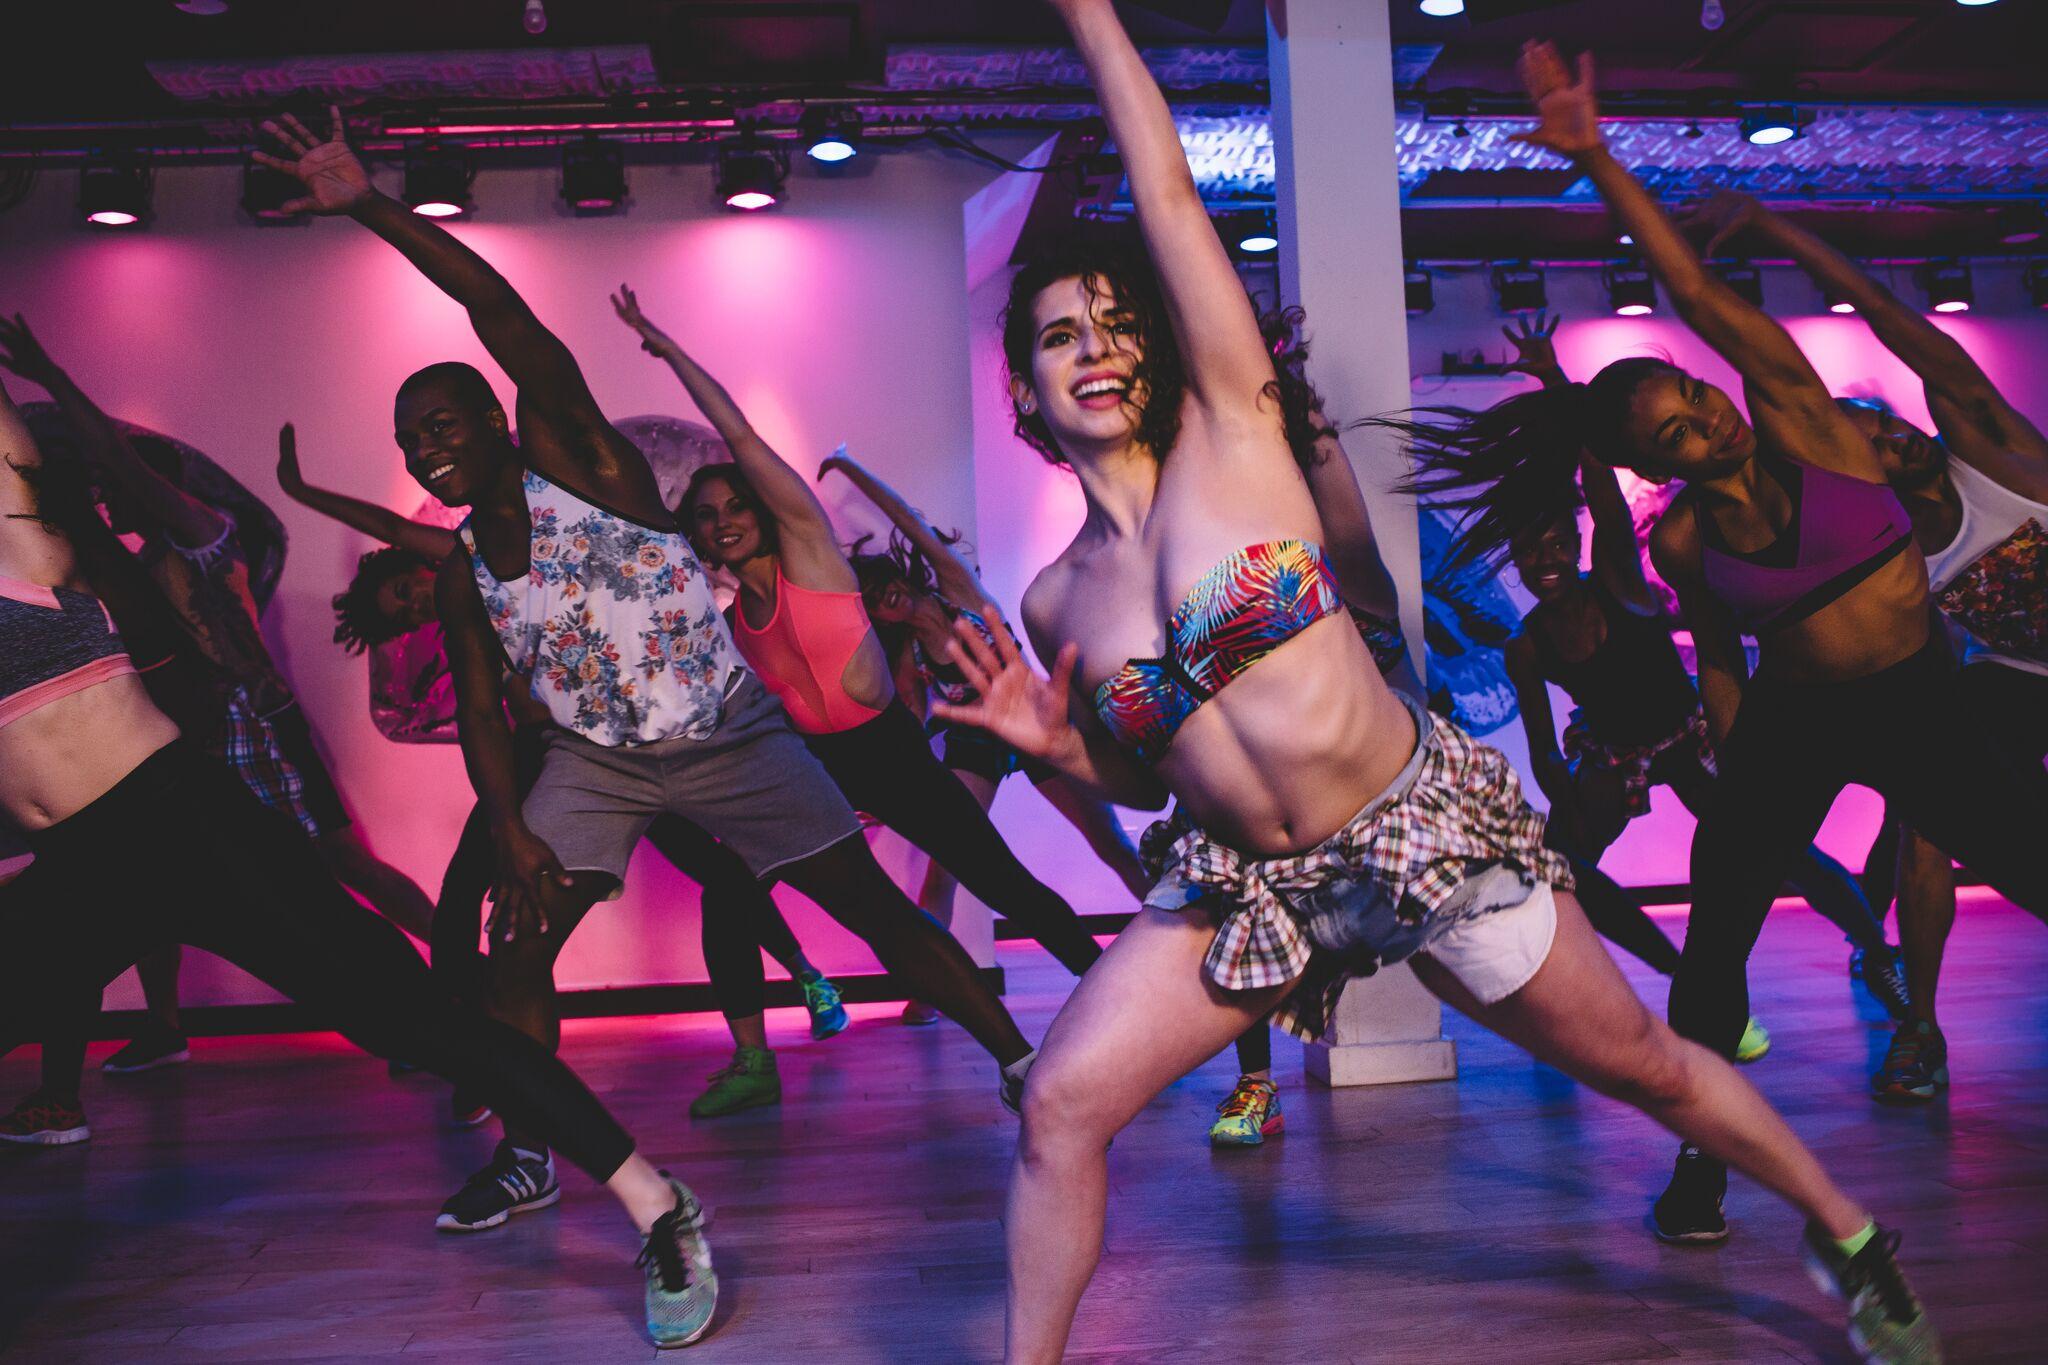 305 Dancing Girl Dance Cardio Class.jpg